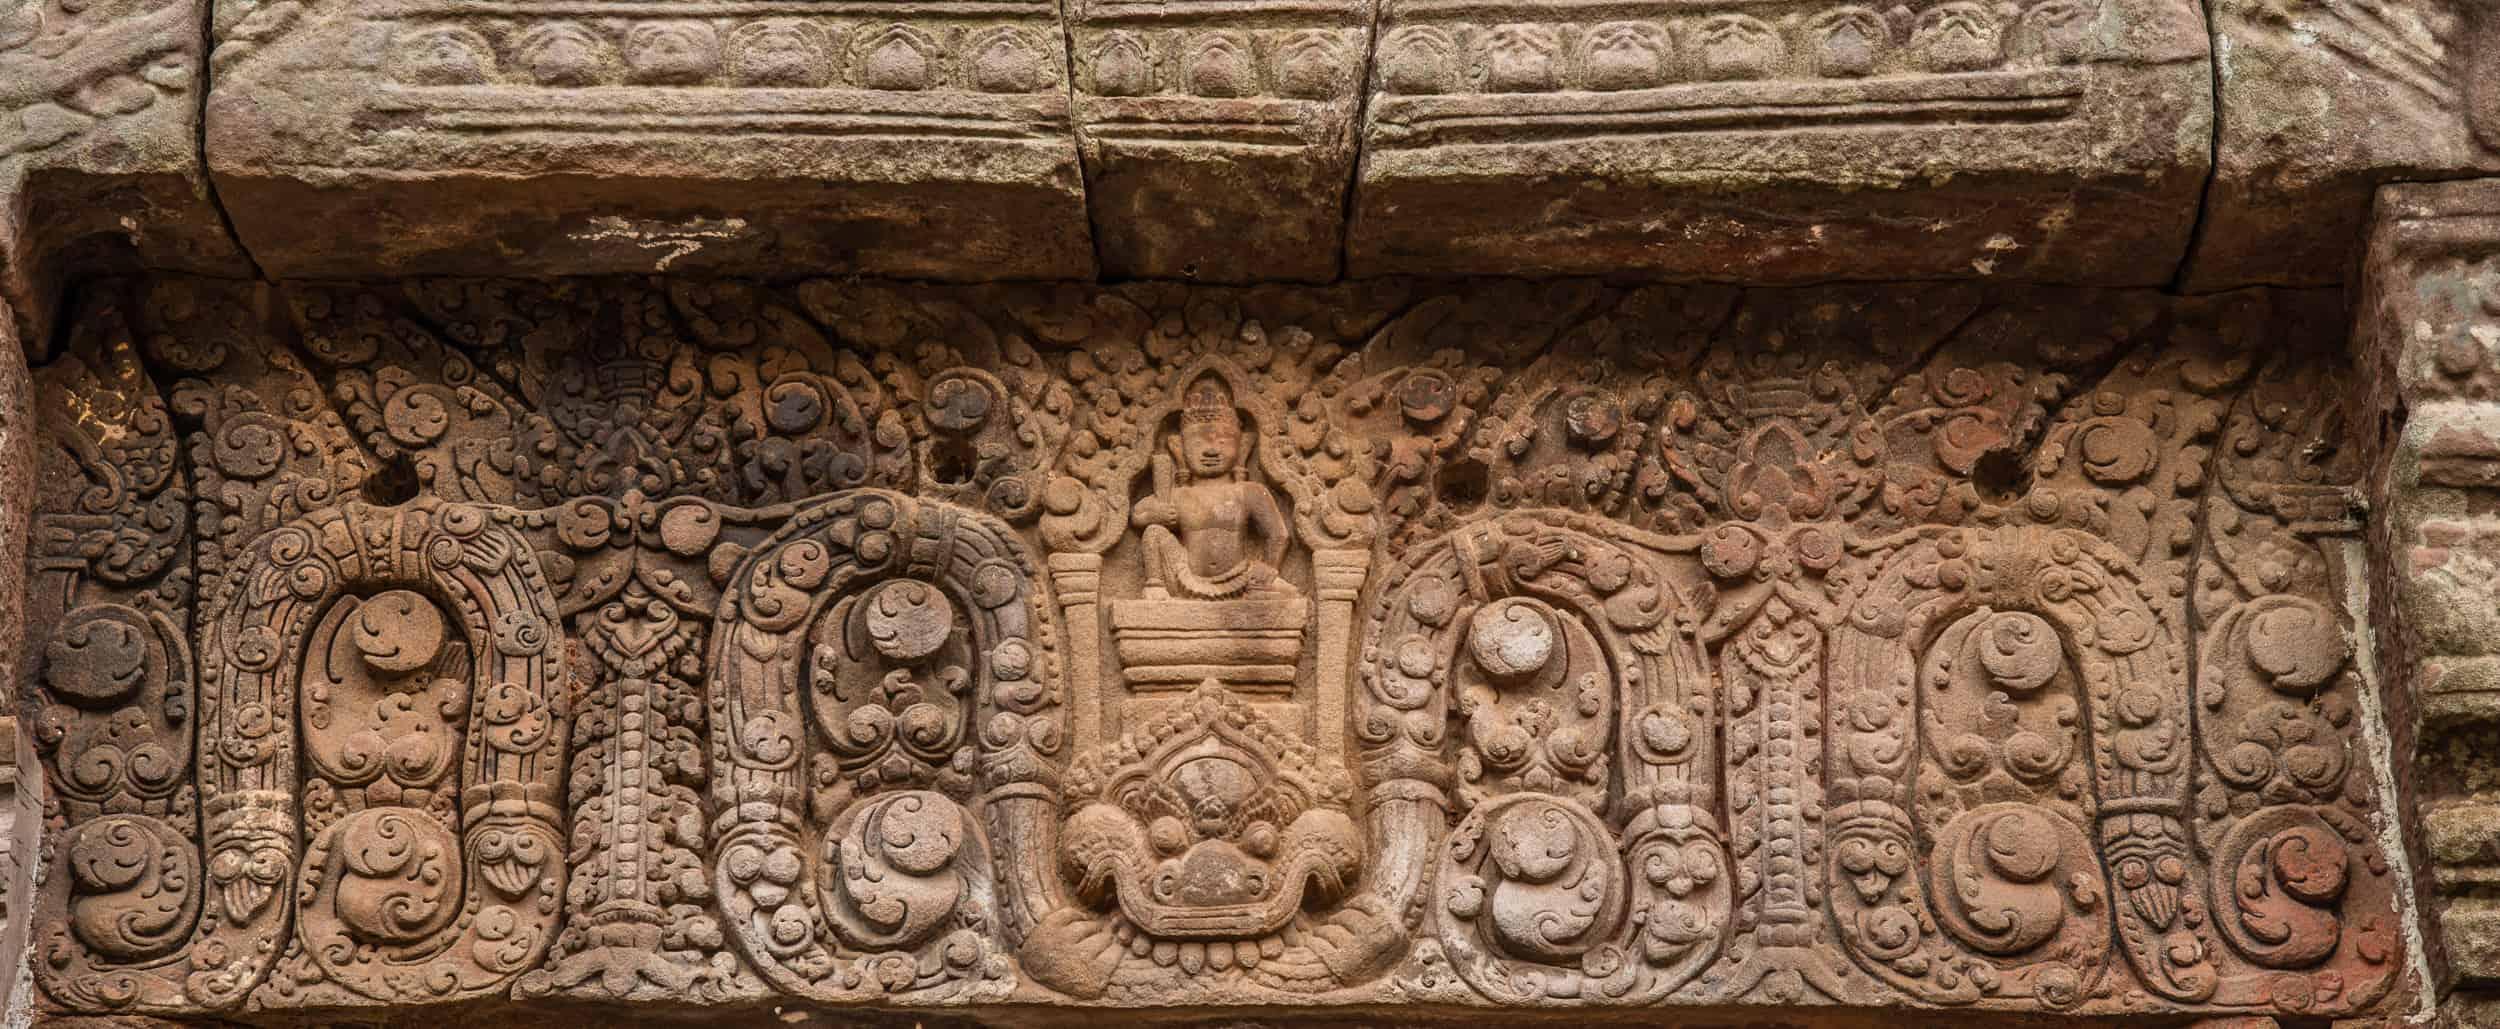 Latei boven de deur van het heiligdom van Wat Phou